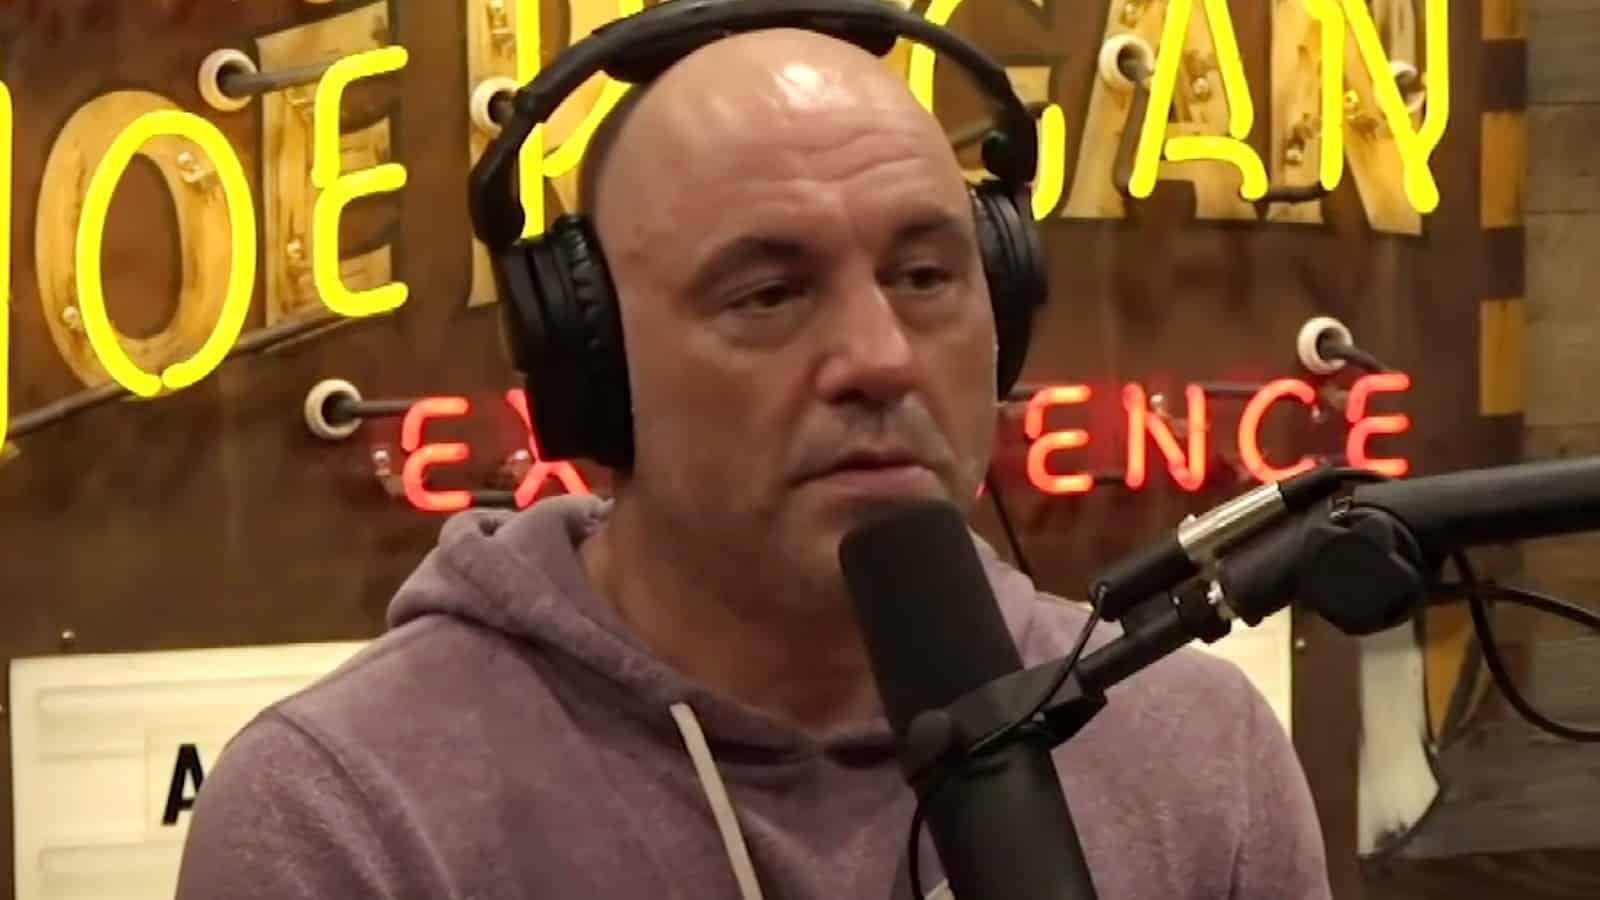 """White Men Aren't Allowed To Talk Anymore"" Joe Rogan Tells 190 Million Listeners During 3-Hour Podcast"